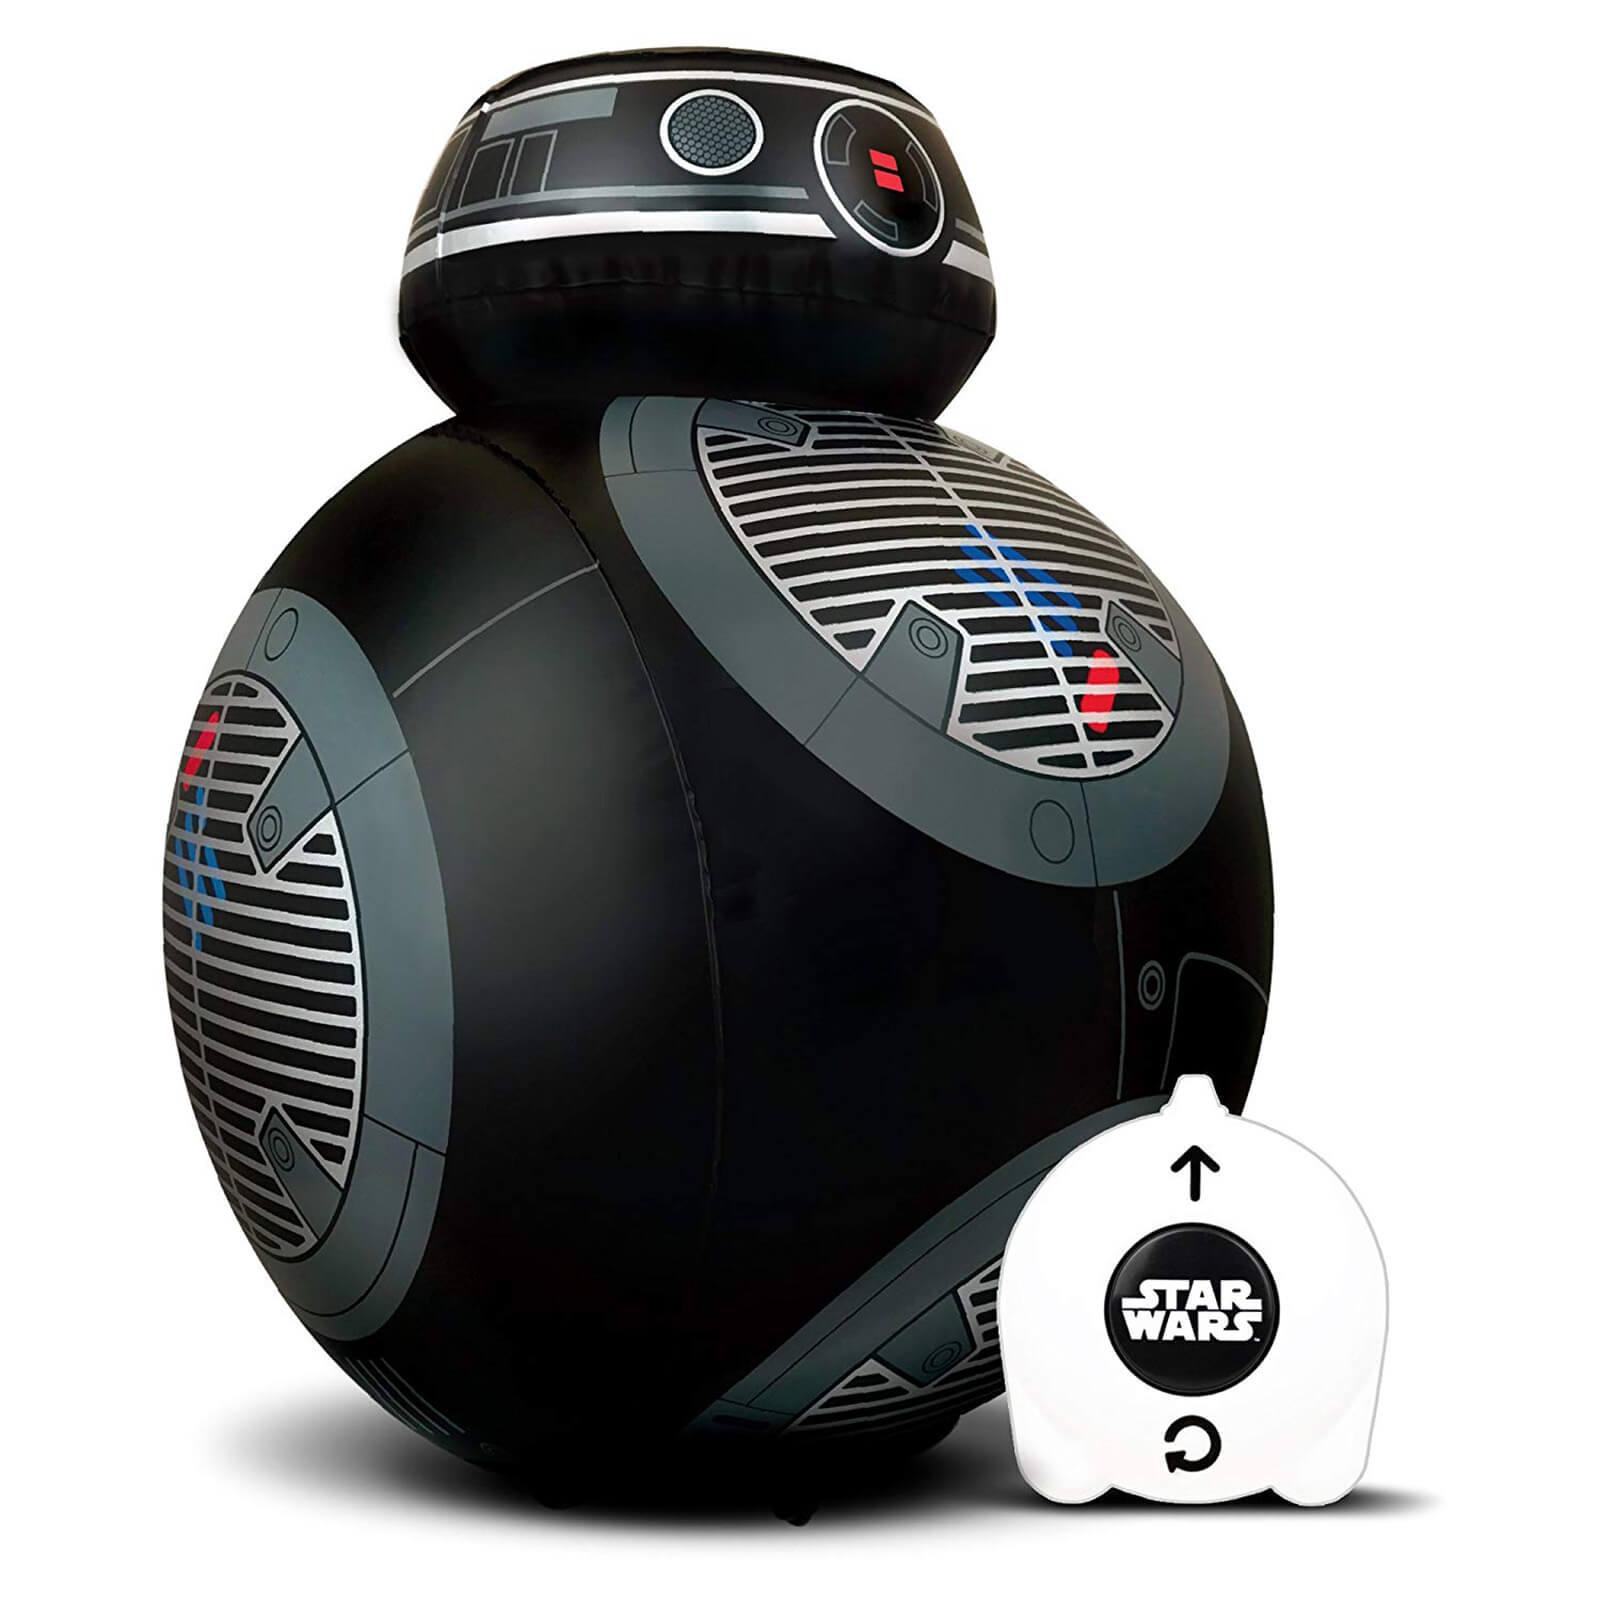 Bladez Toyz Star Wars Radio Control Inflatable Jumbo Droid BB-9E